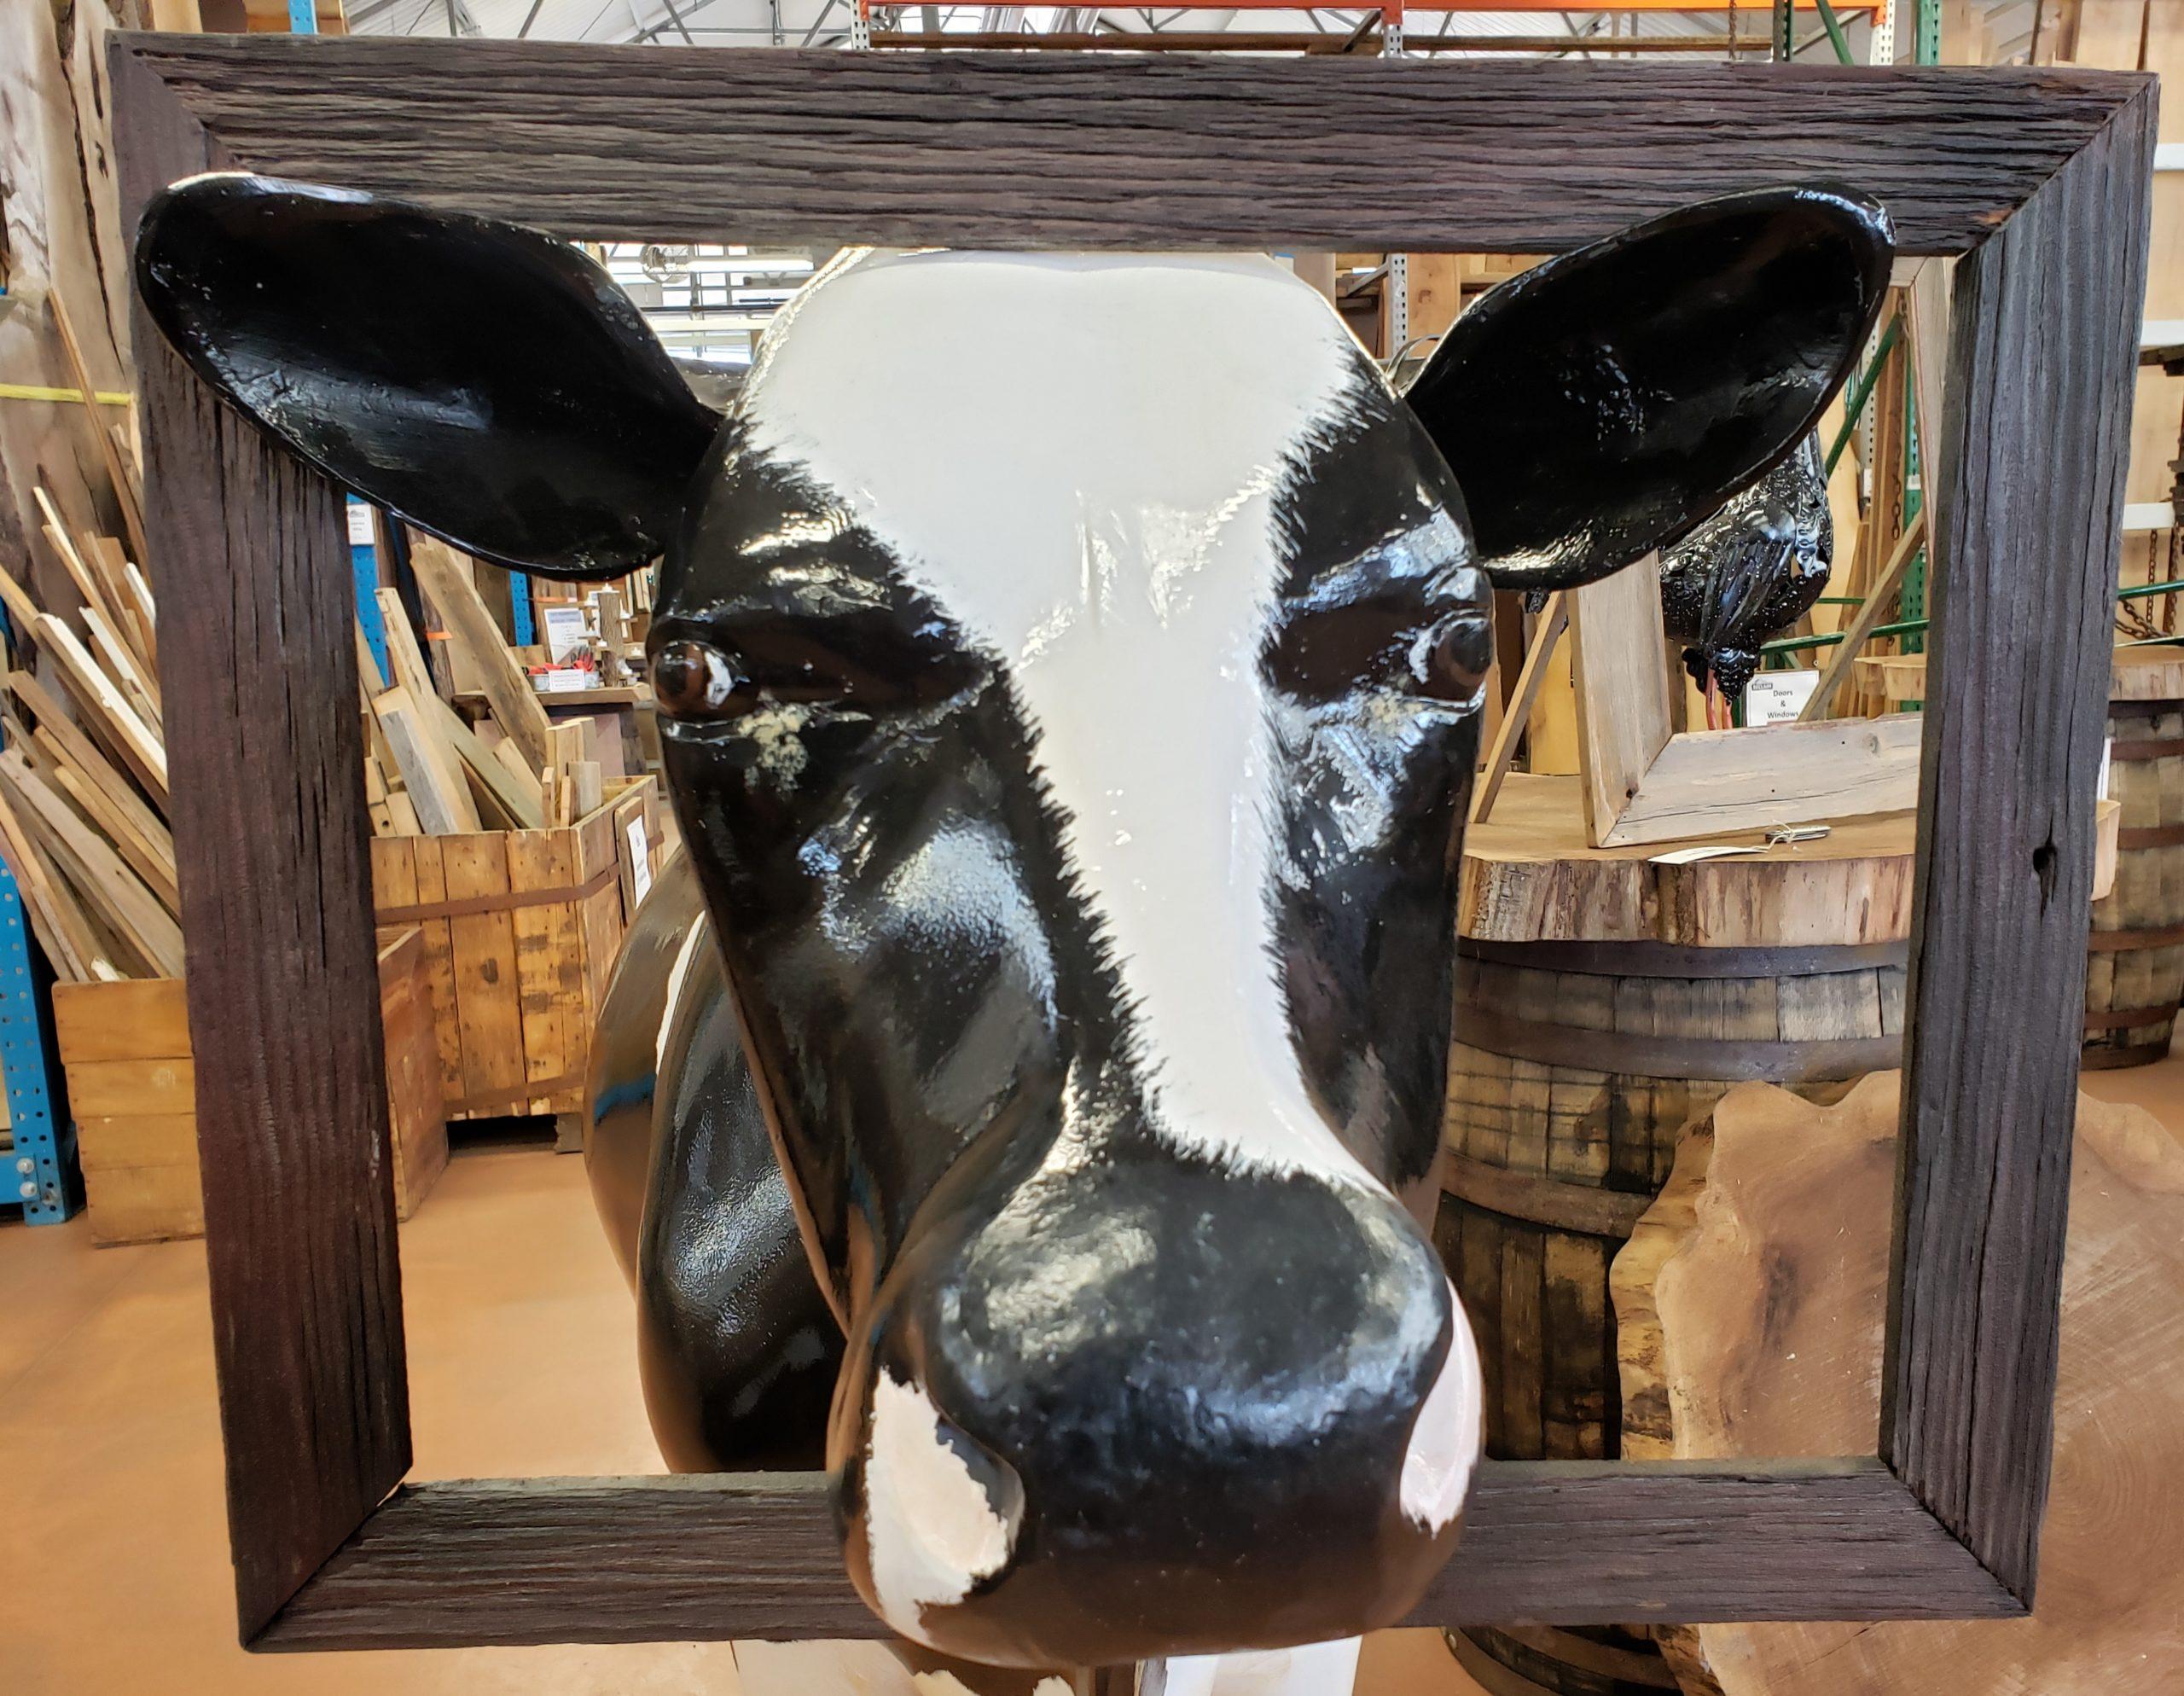 1. Cow